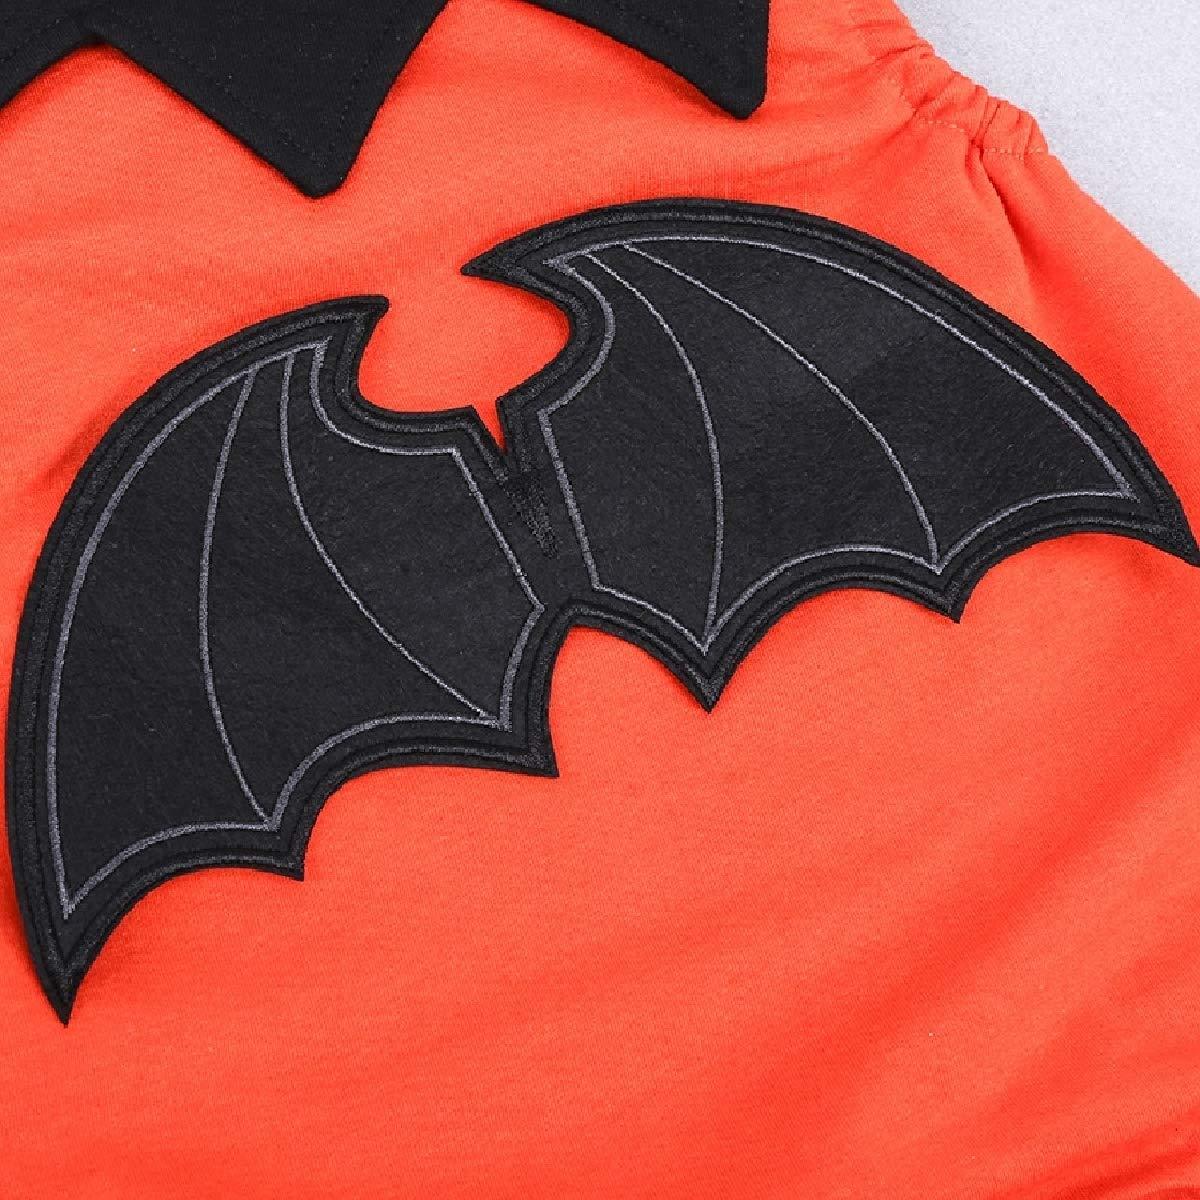 YUNY Baby Cute Fall Winter Cute Halloween Cartoon Romper Jumpsuit Orange 100